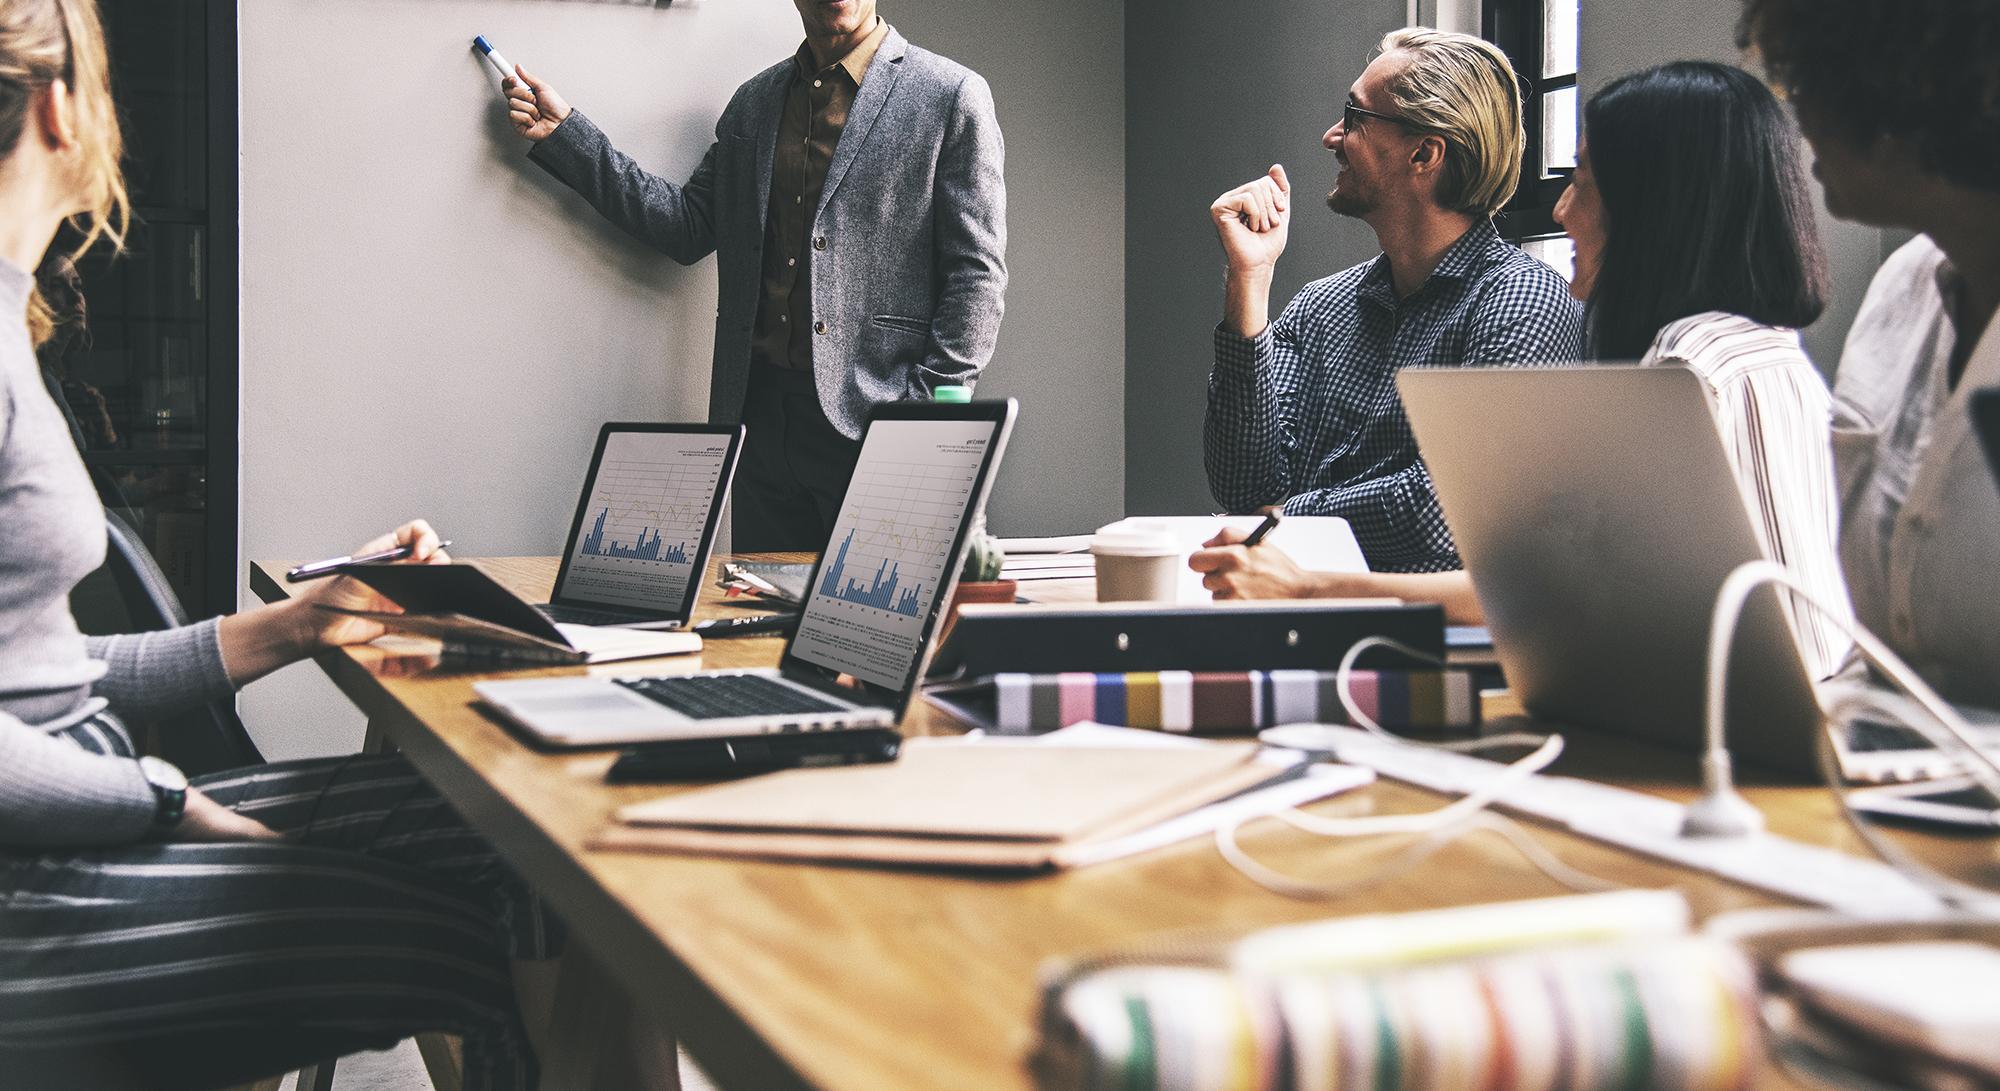 Para workshop governanca tributaria na era digital